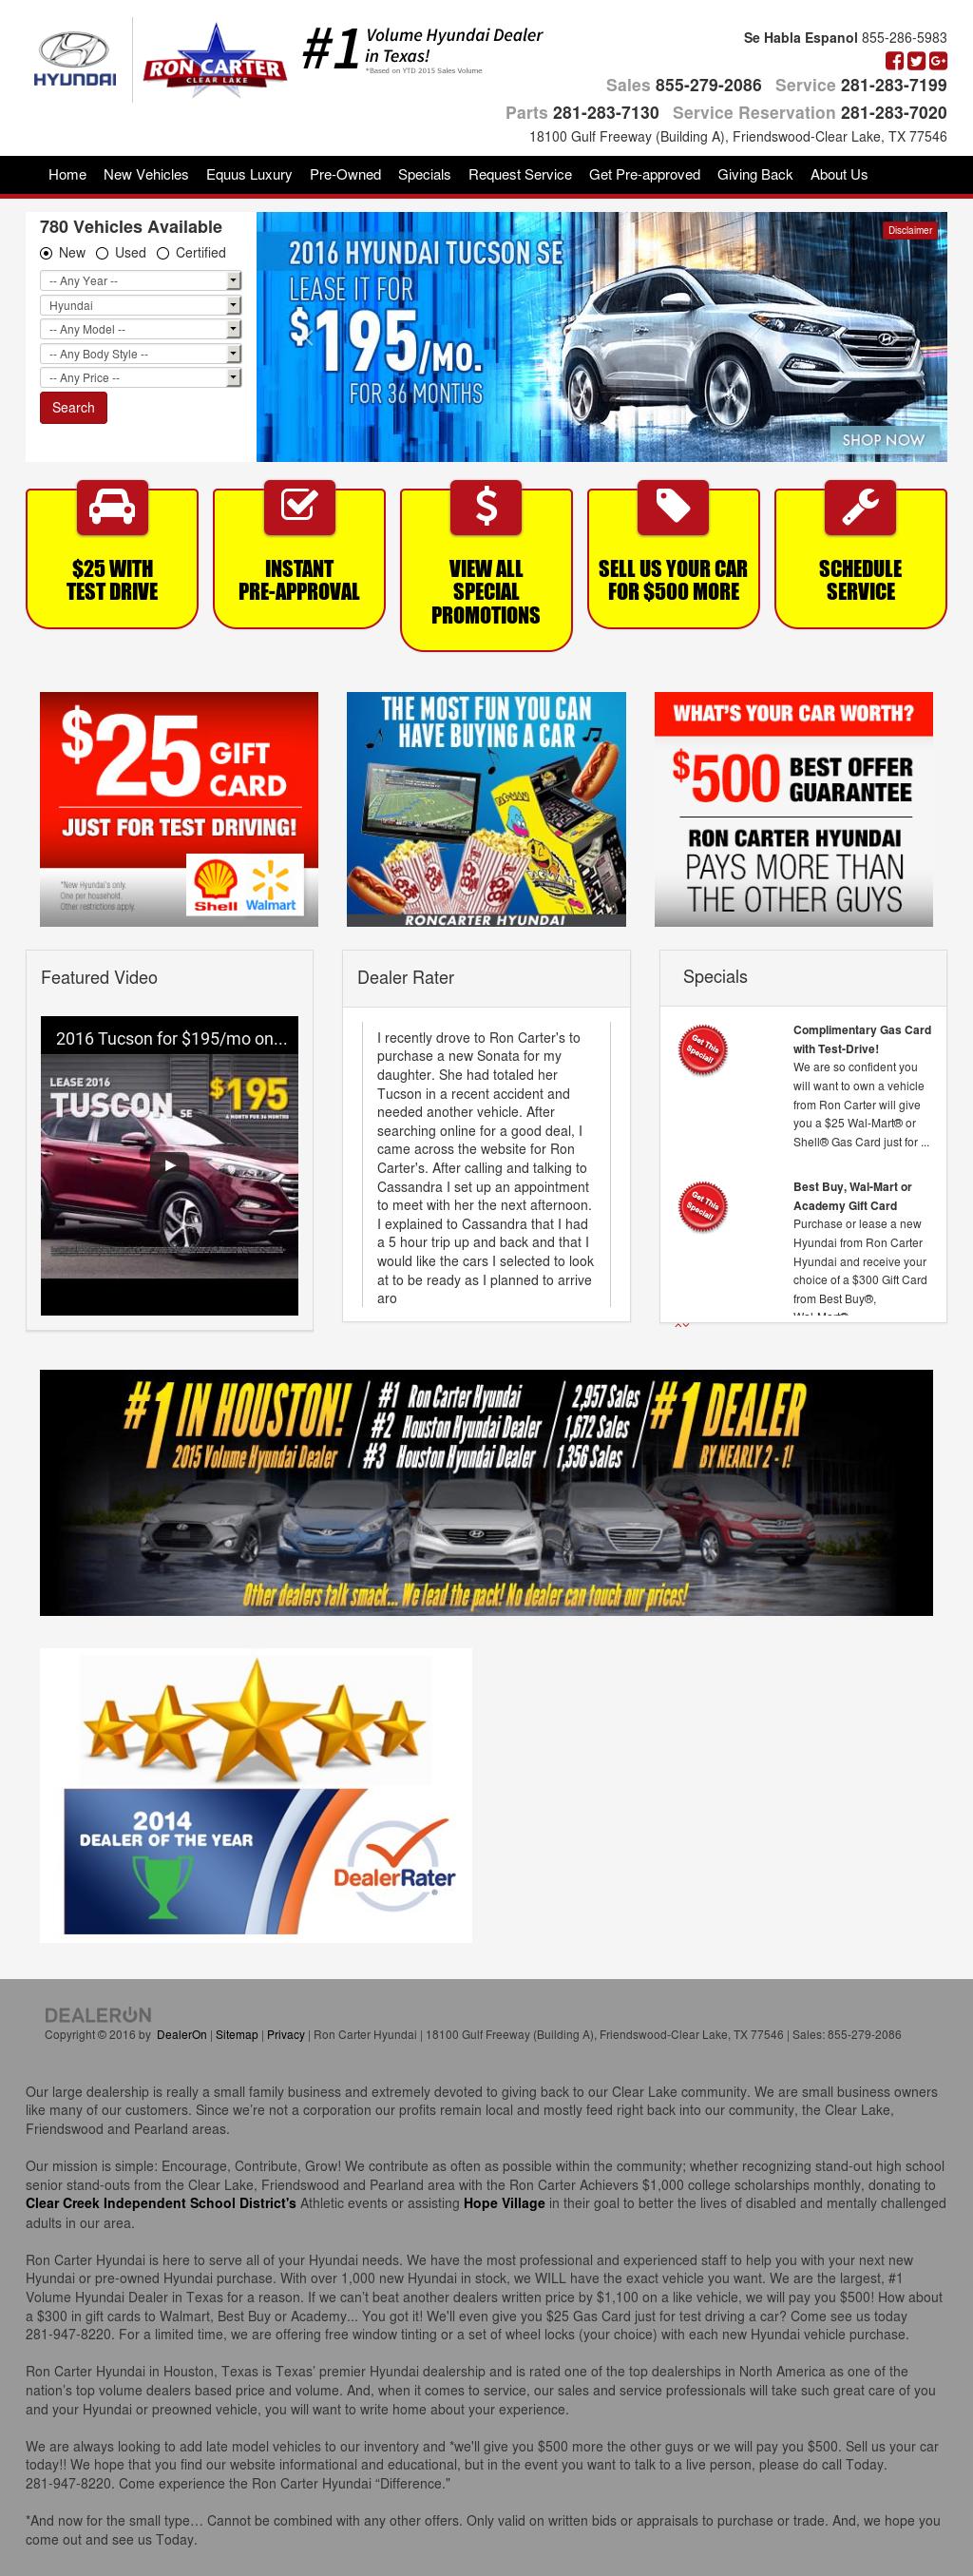 Ron Carter Hyundai petitors Revenue and Employees Owler